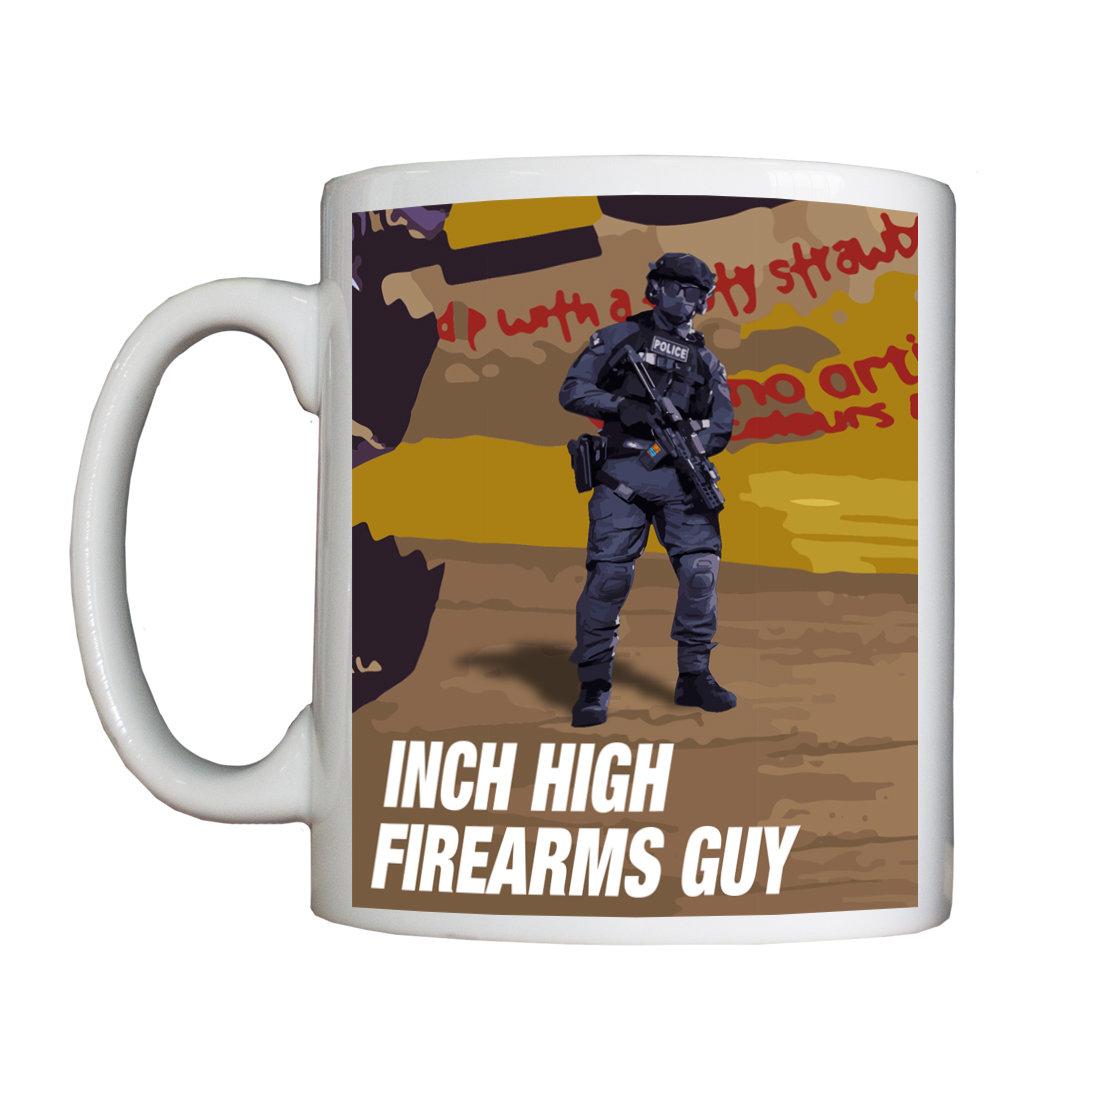 Personalised 'Inch High Firearms Guy' Drinking Vessel InchHighFirearmsGuyVessel